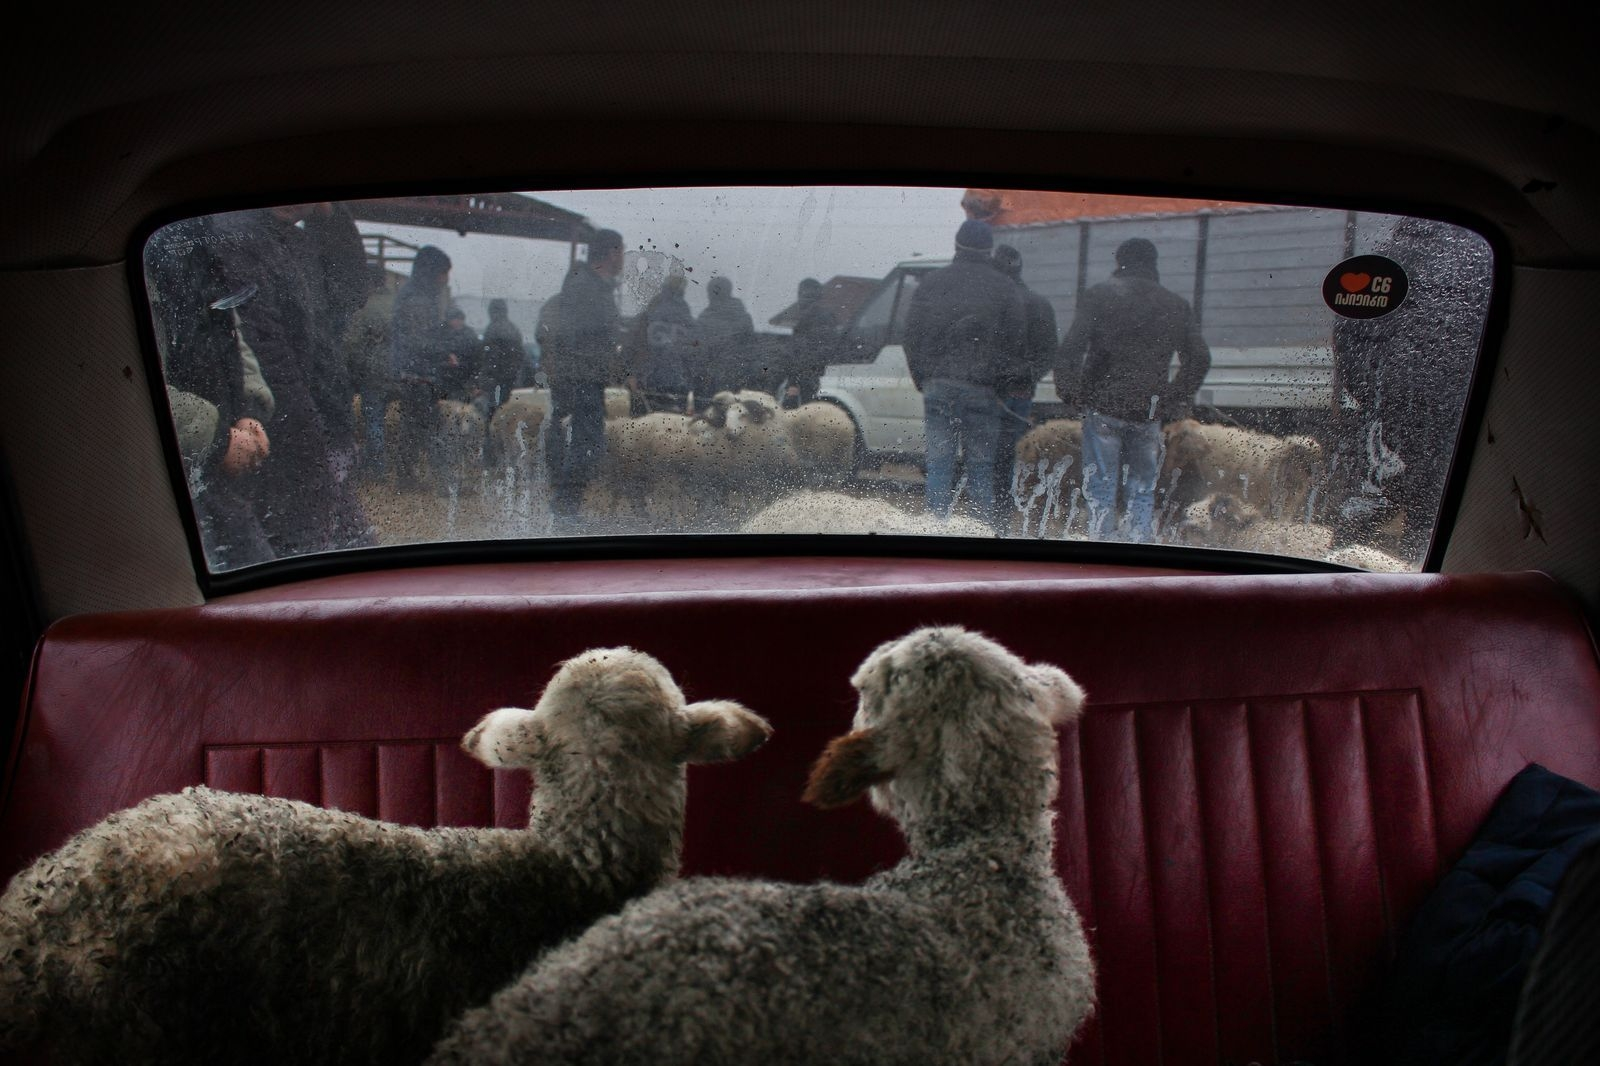 Photograph by Khatia Nikabadze, National Geographic Your Shot